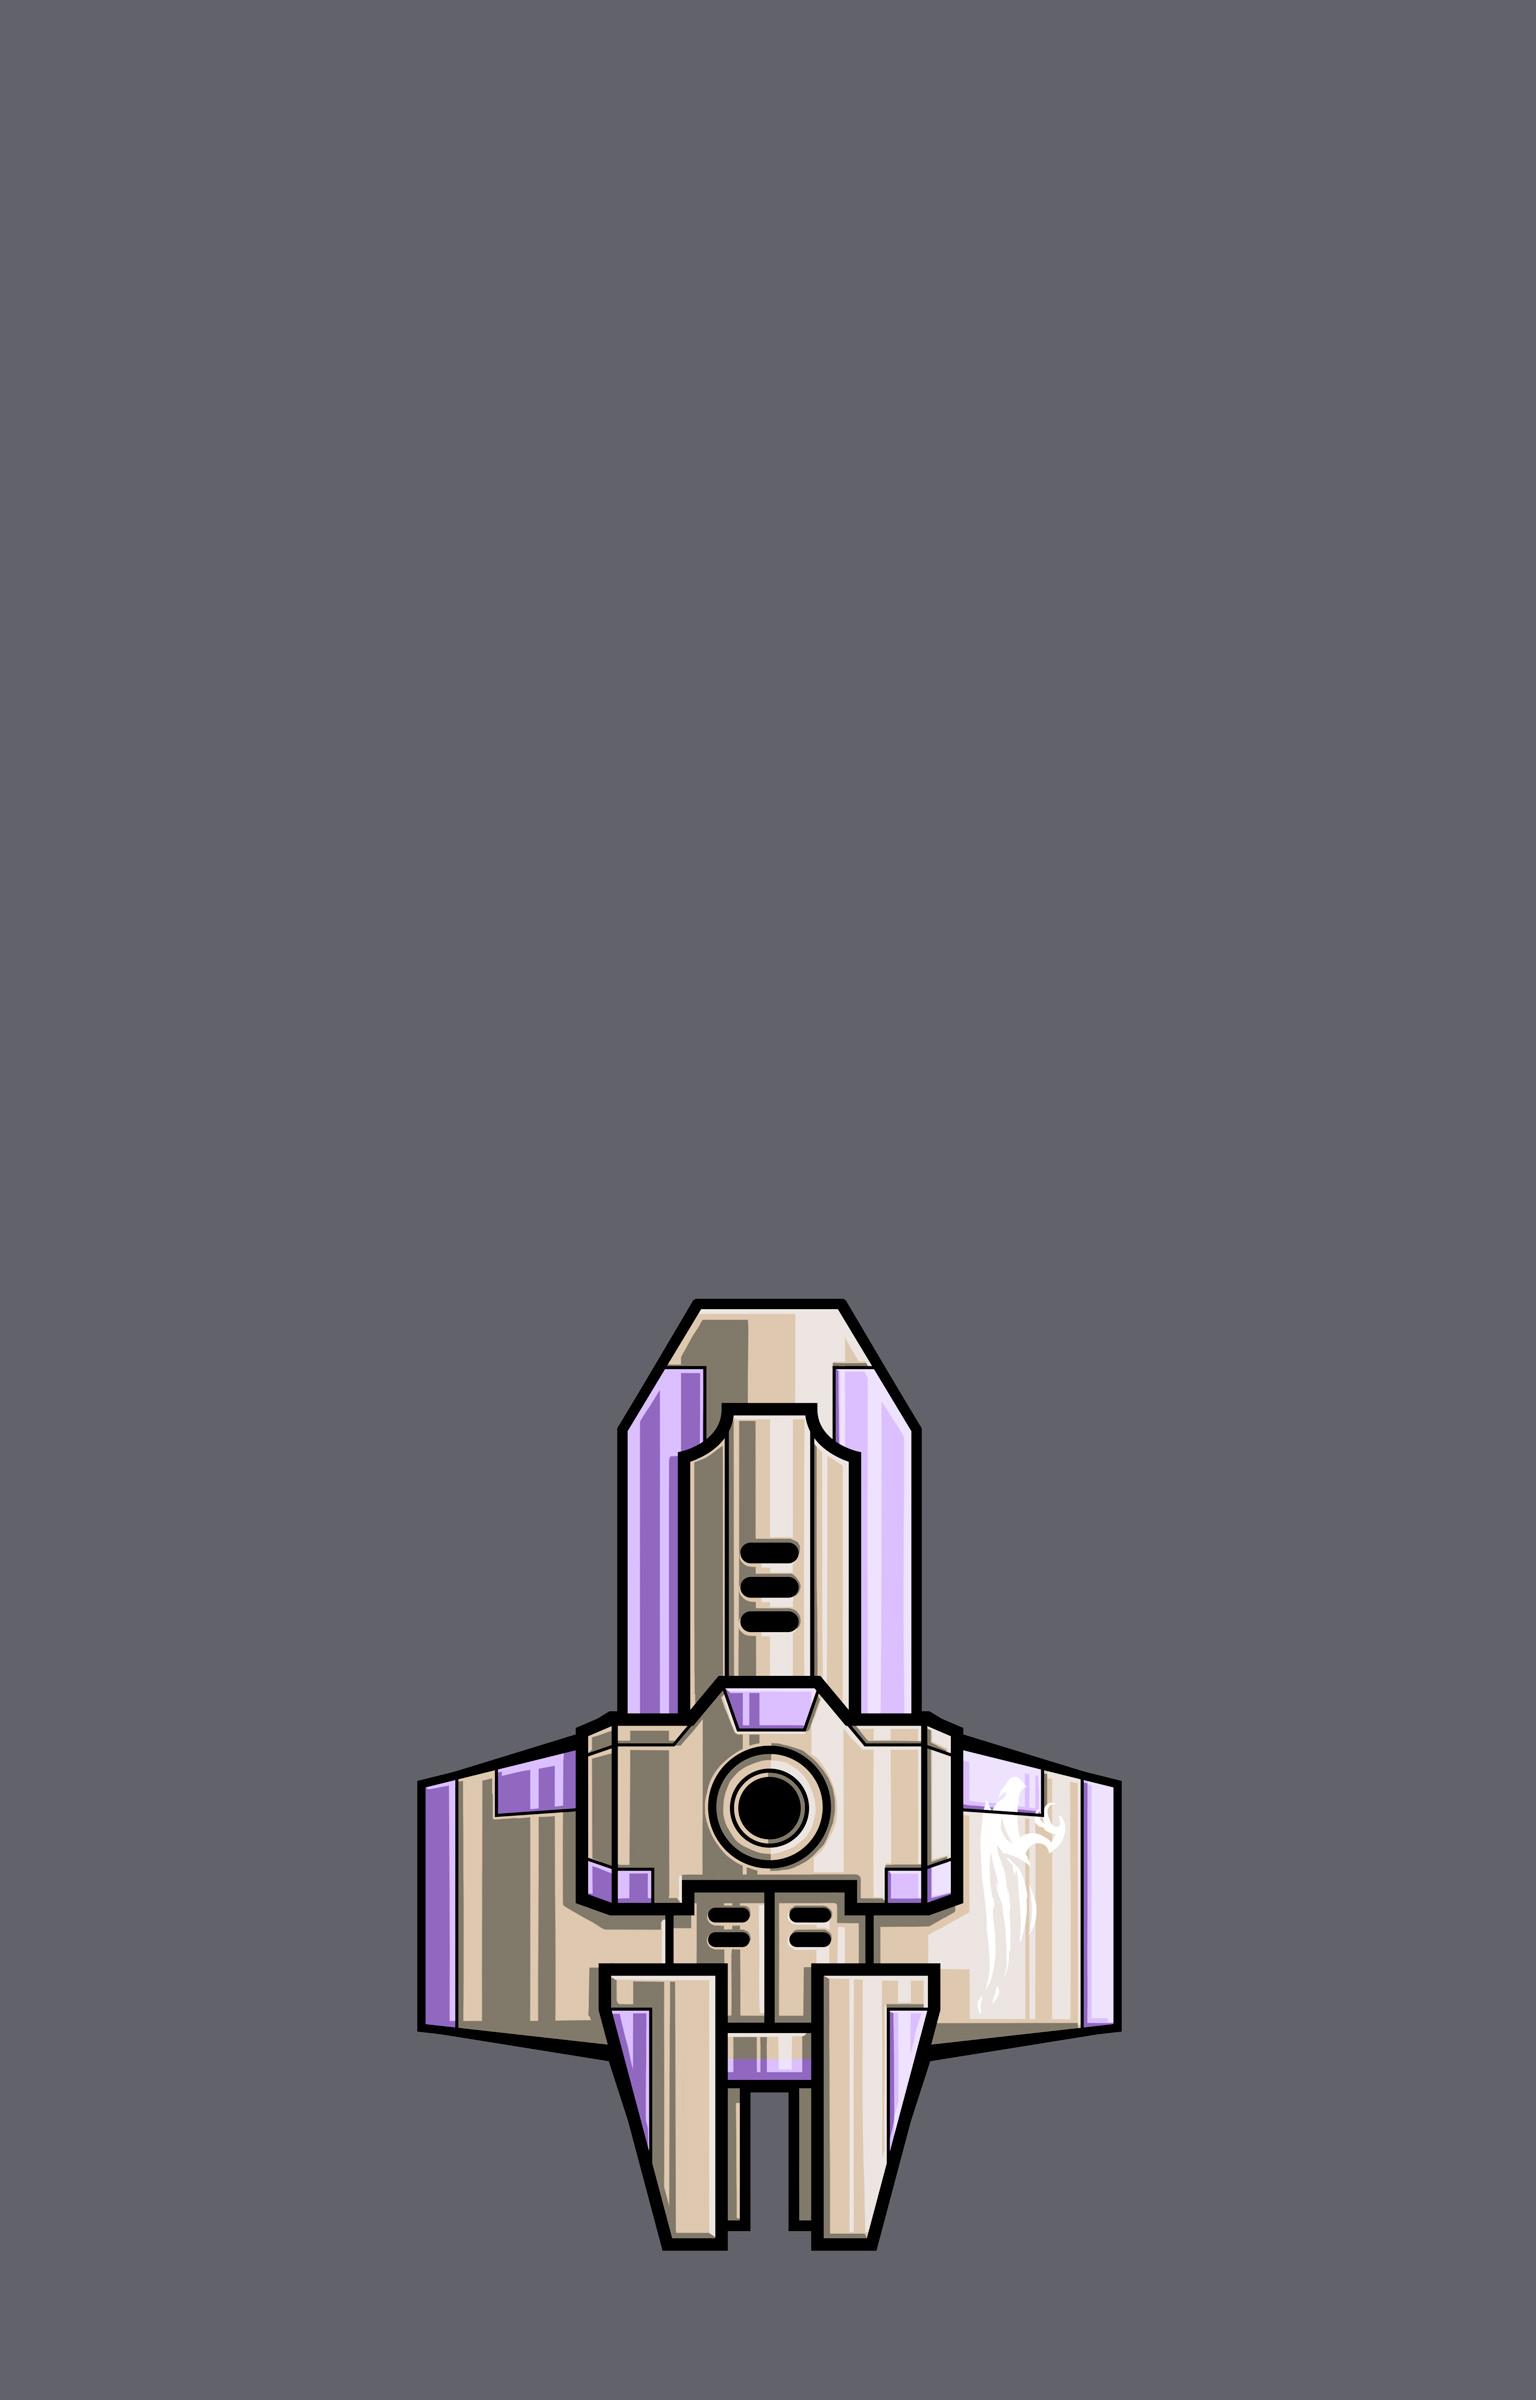 Ship_Rebel_Thalia1.jpg